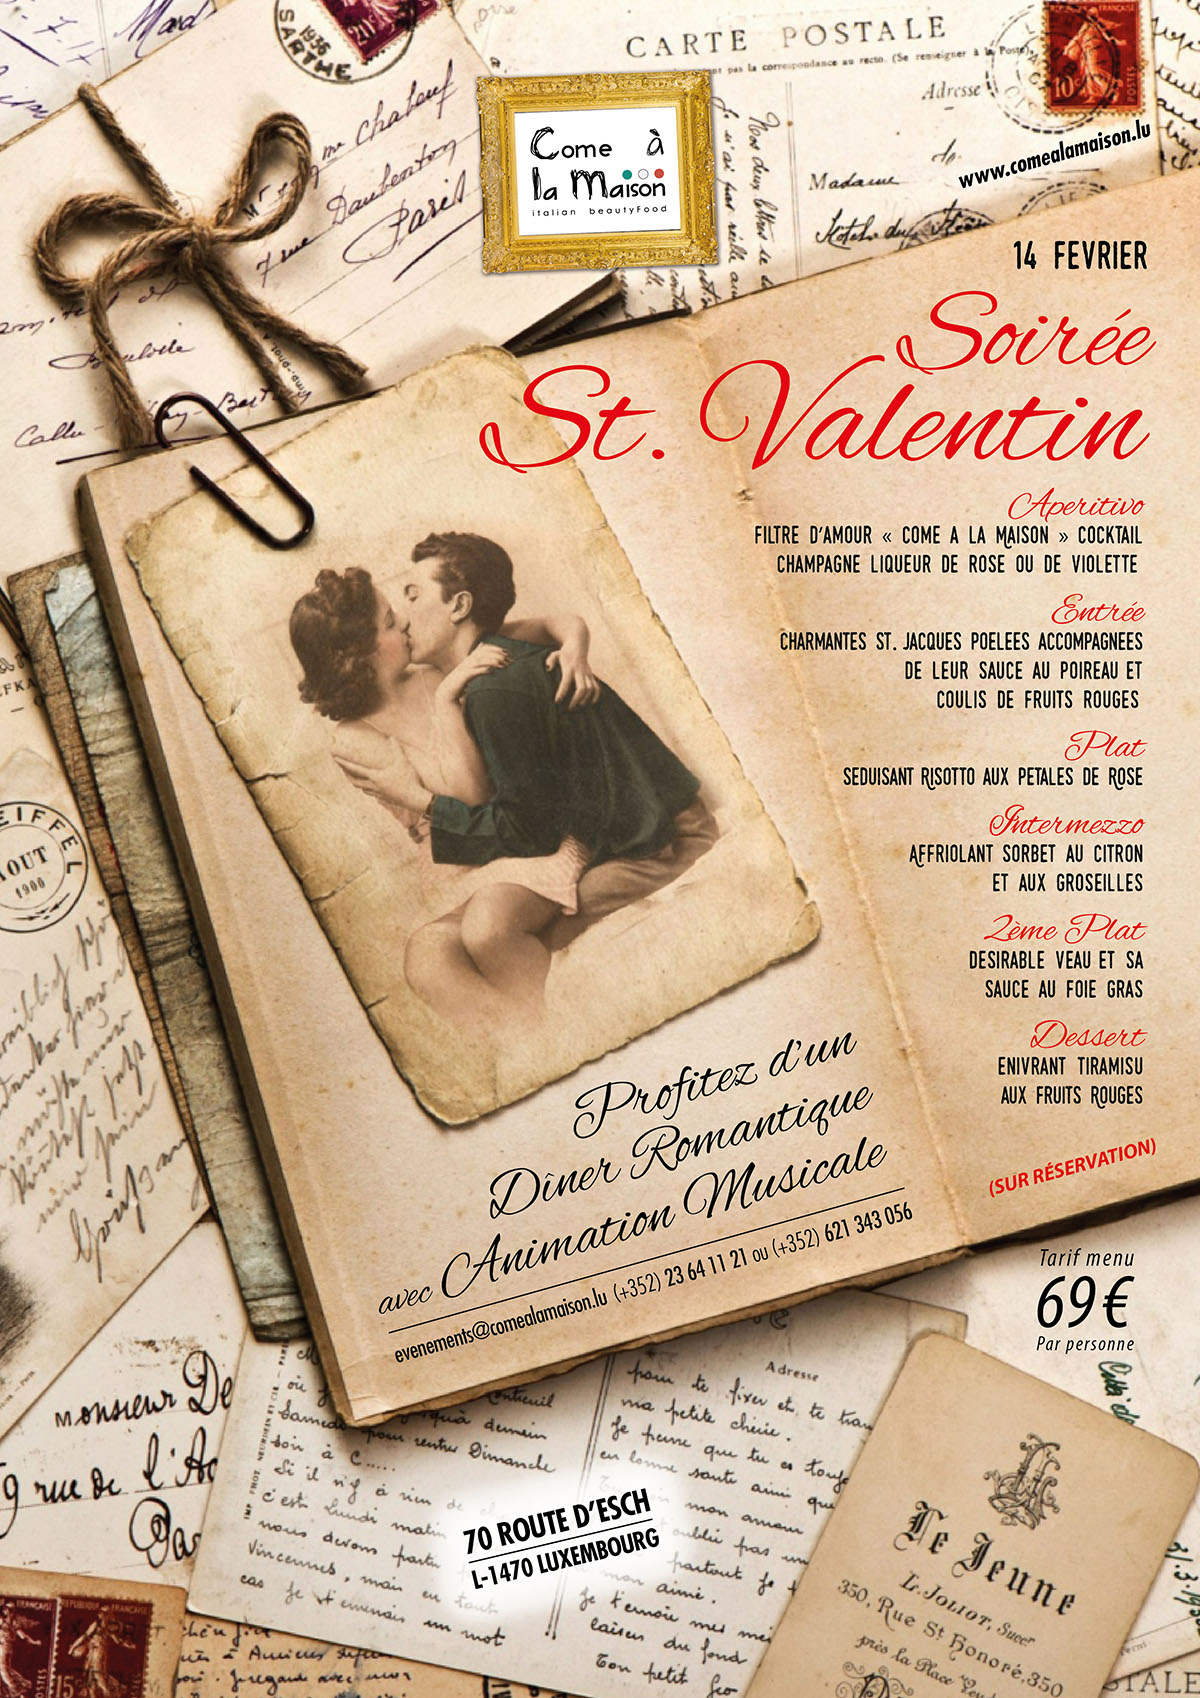 Saint-Valentin (Soirée)